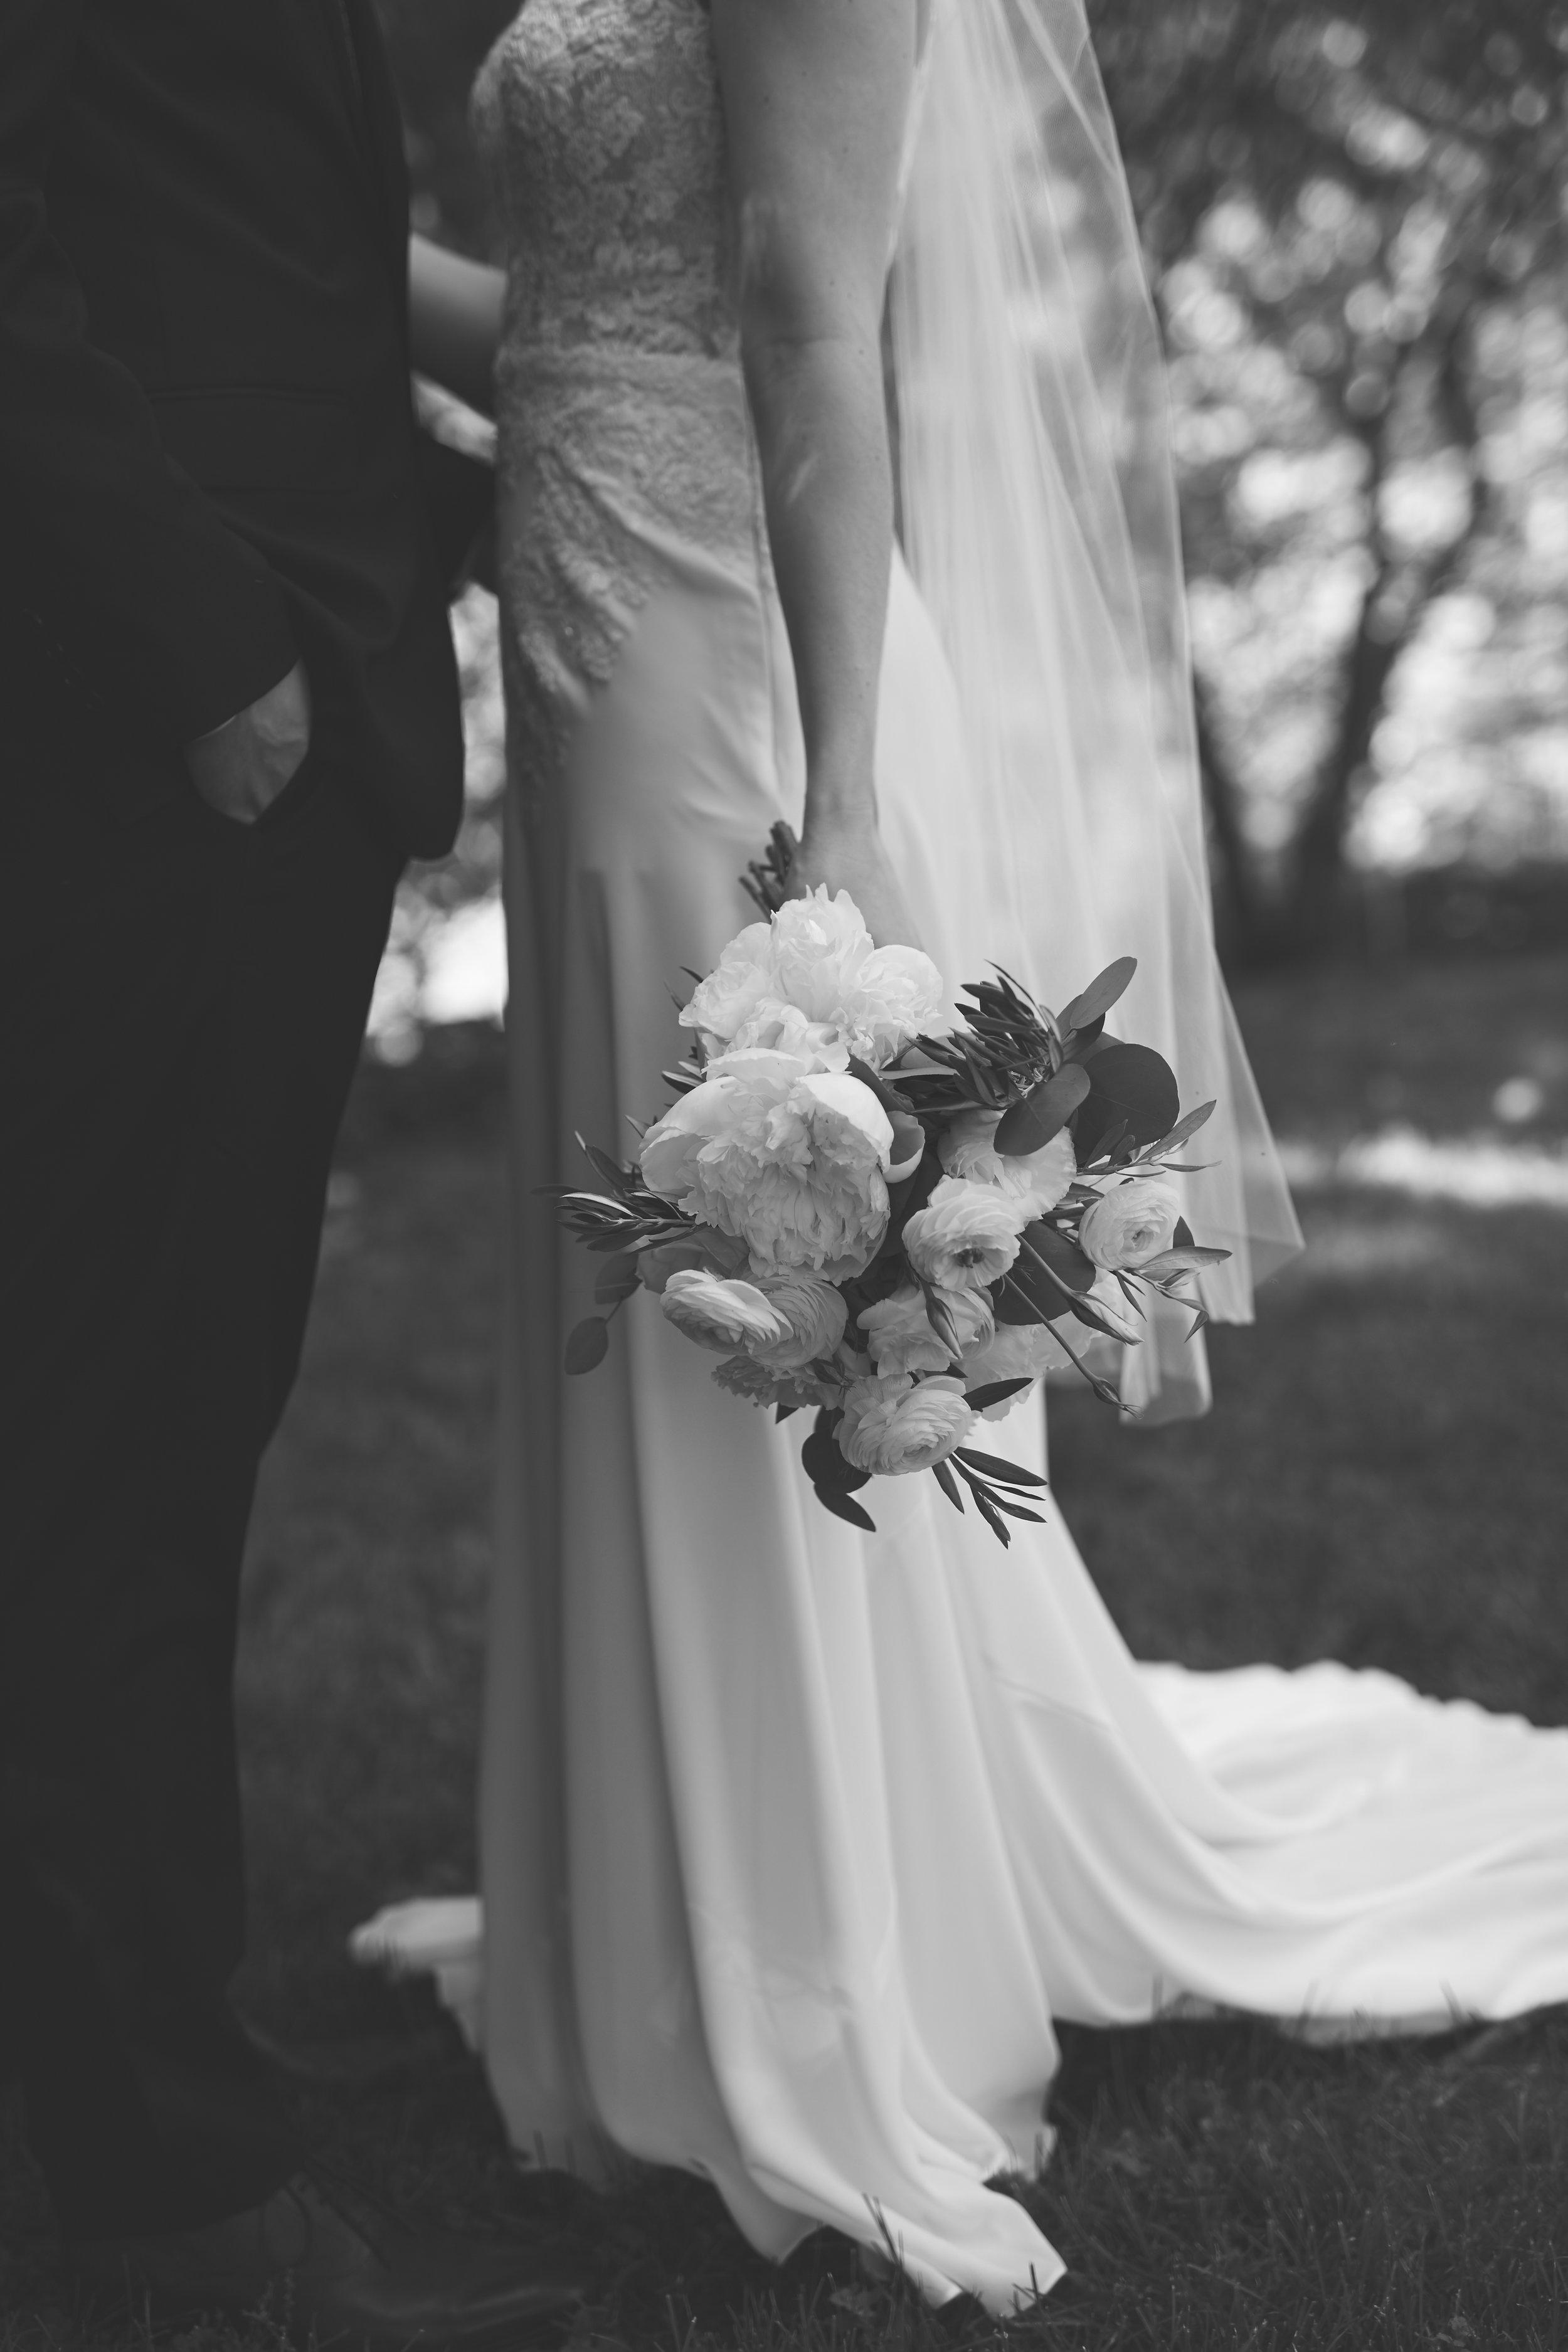 Romantic Black & White Couple